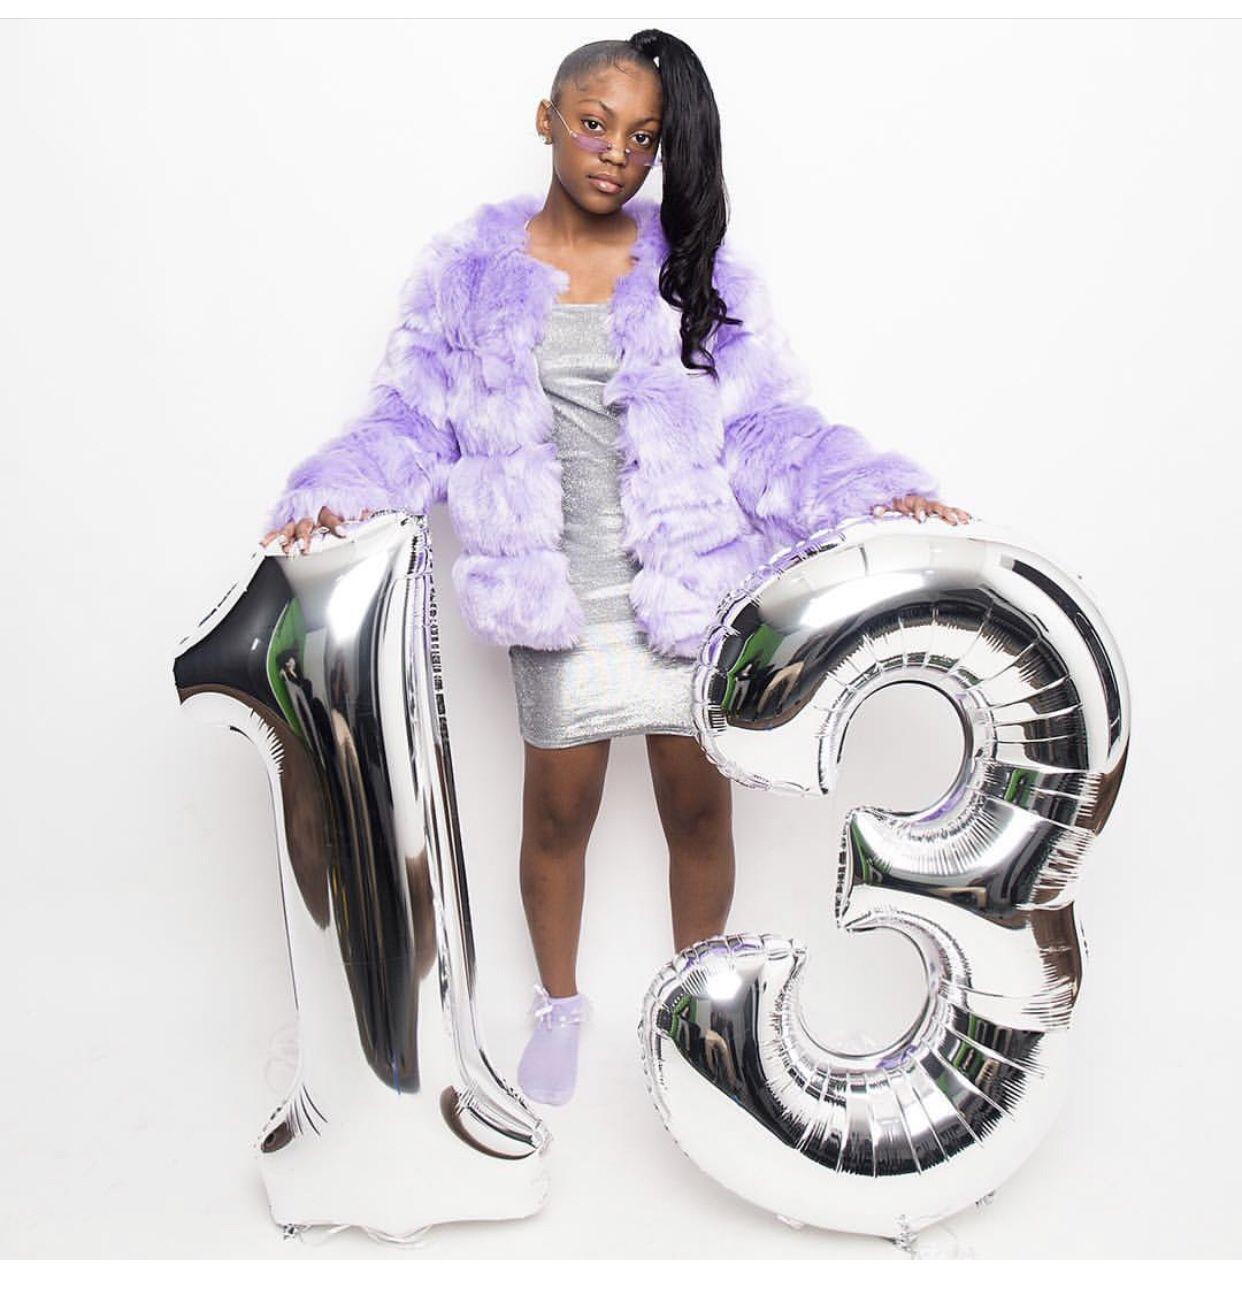 BiRTHDAY PHOTOSHOOT Birthday fashion, Cute birthday